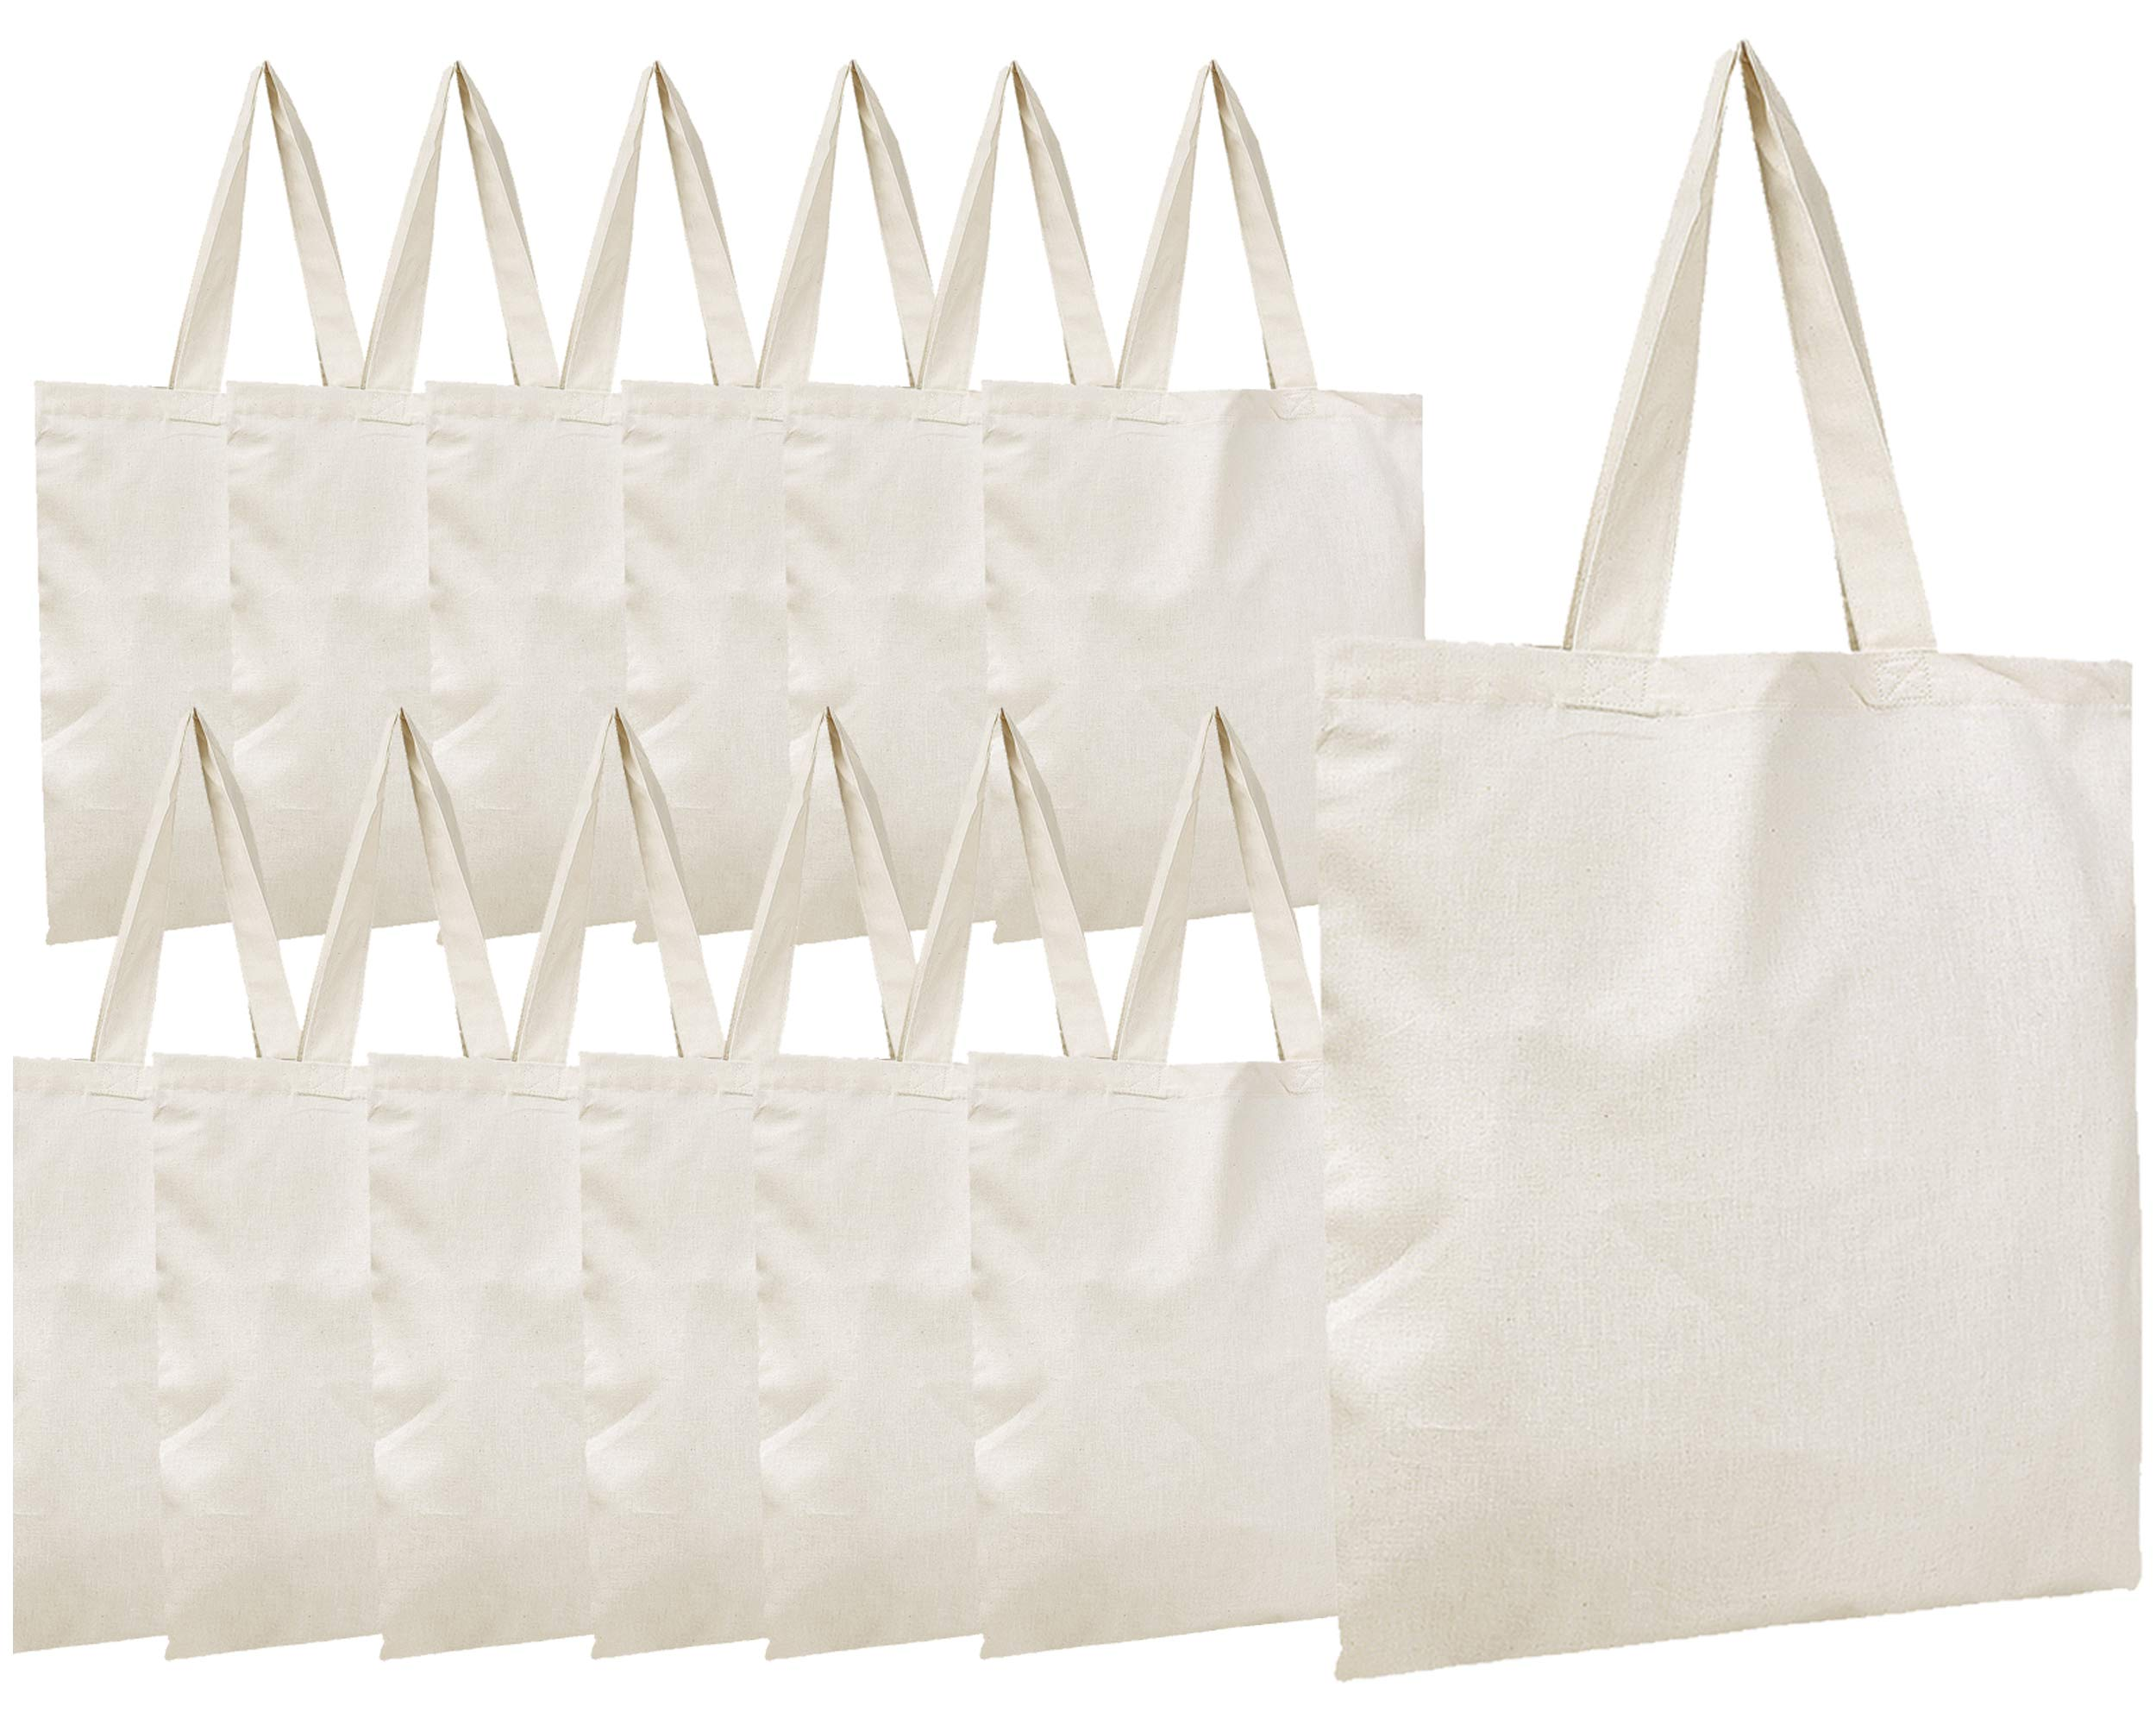 79186e7dc5 BagzDepot Canvas Tote Bags Wholesale - 12 Pack - Plain Cotton Tote Bags in  Bulk